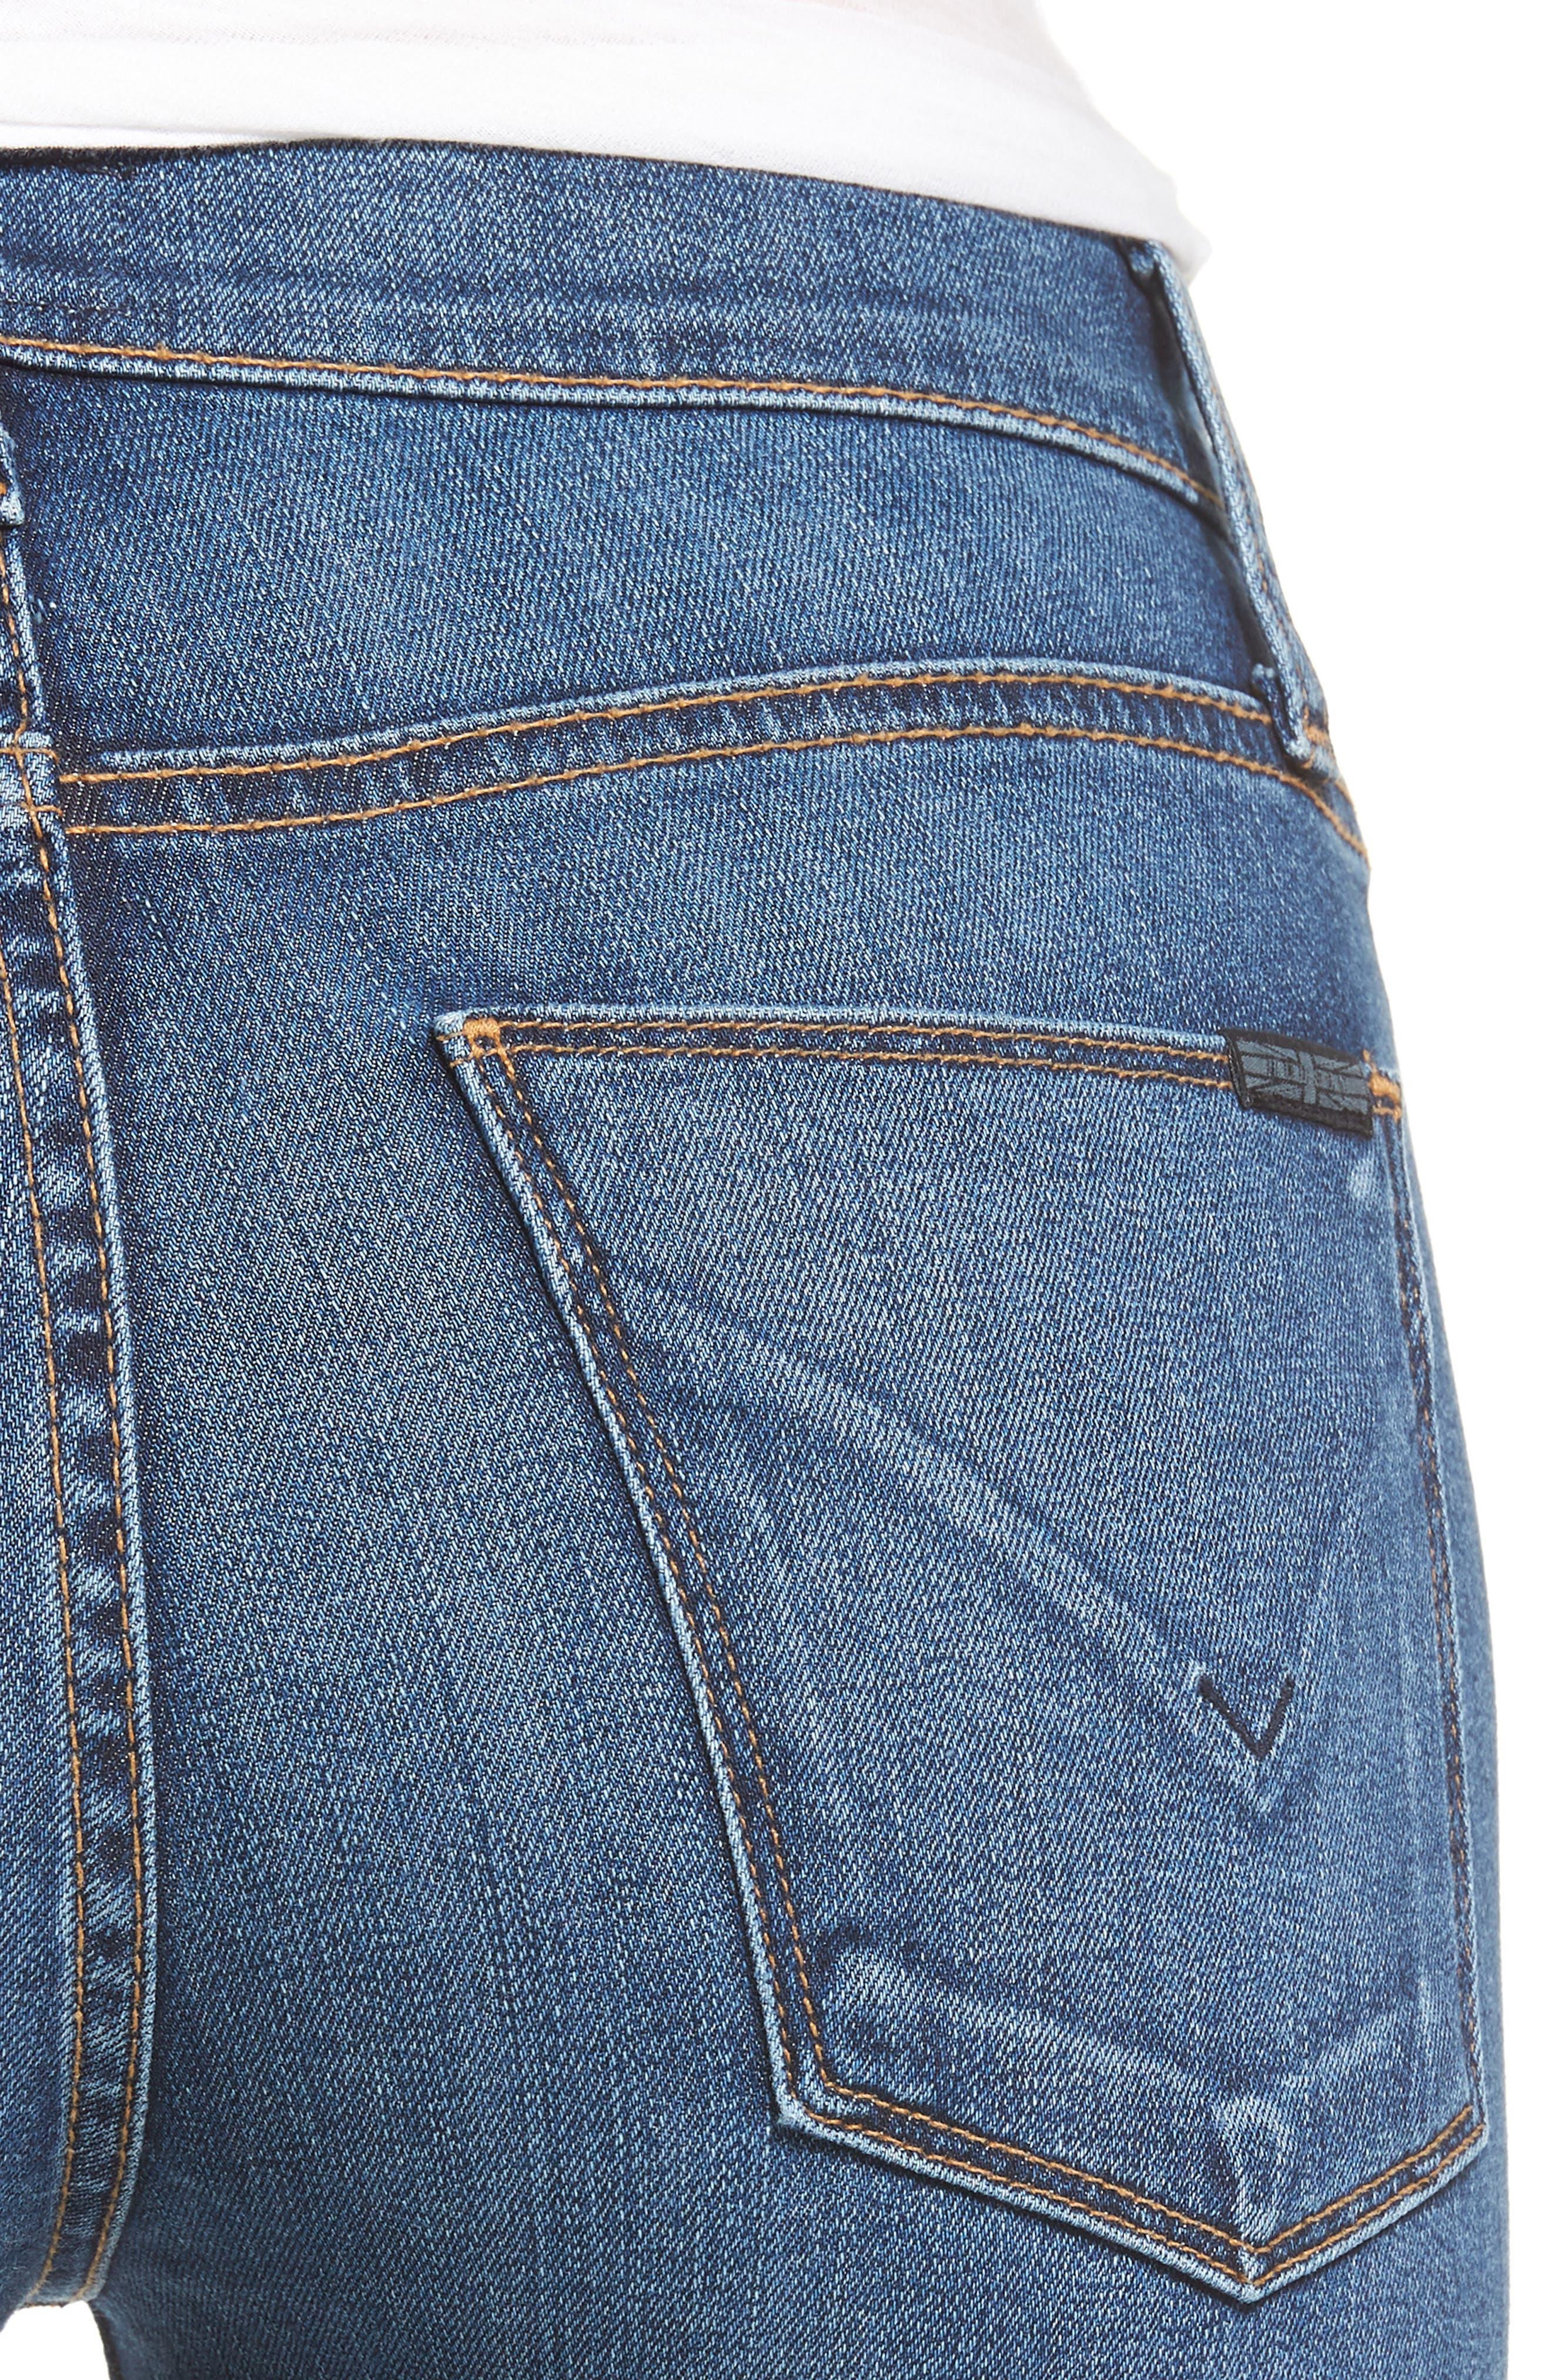 Nico Ankle Super Skinny Jeans,                             Alternate thumbnail 4, color,                             420